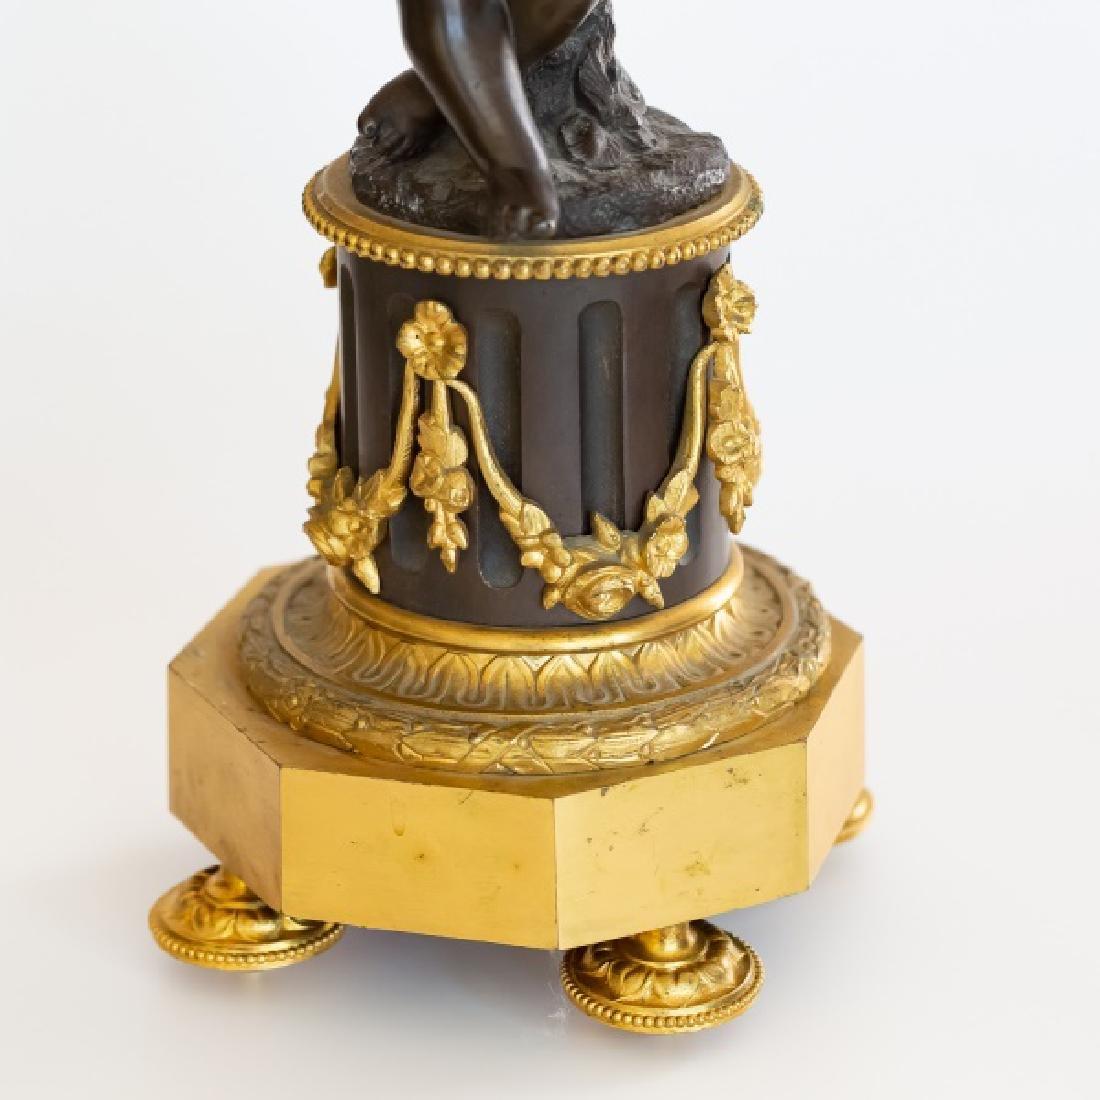 French Patinated & Gilt Bronze Figural Candelabra - 3